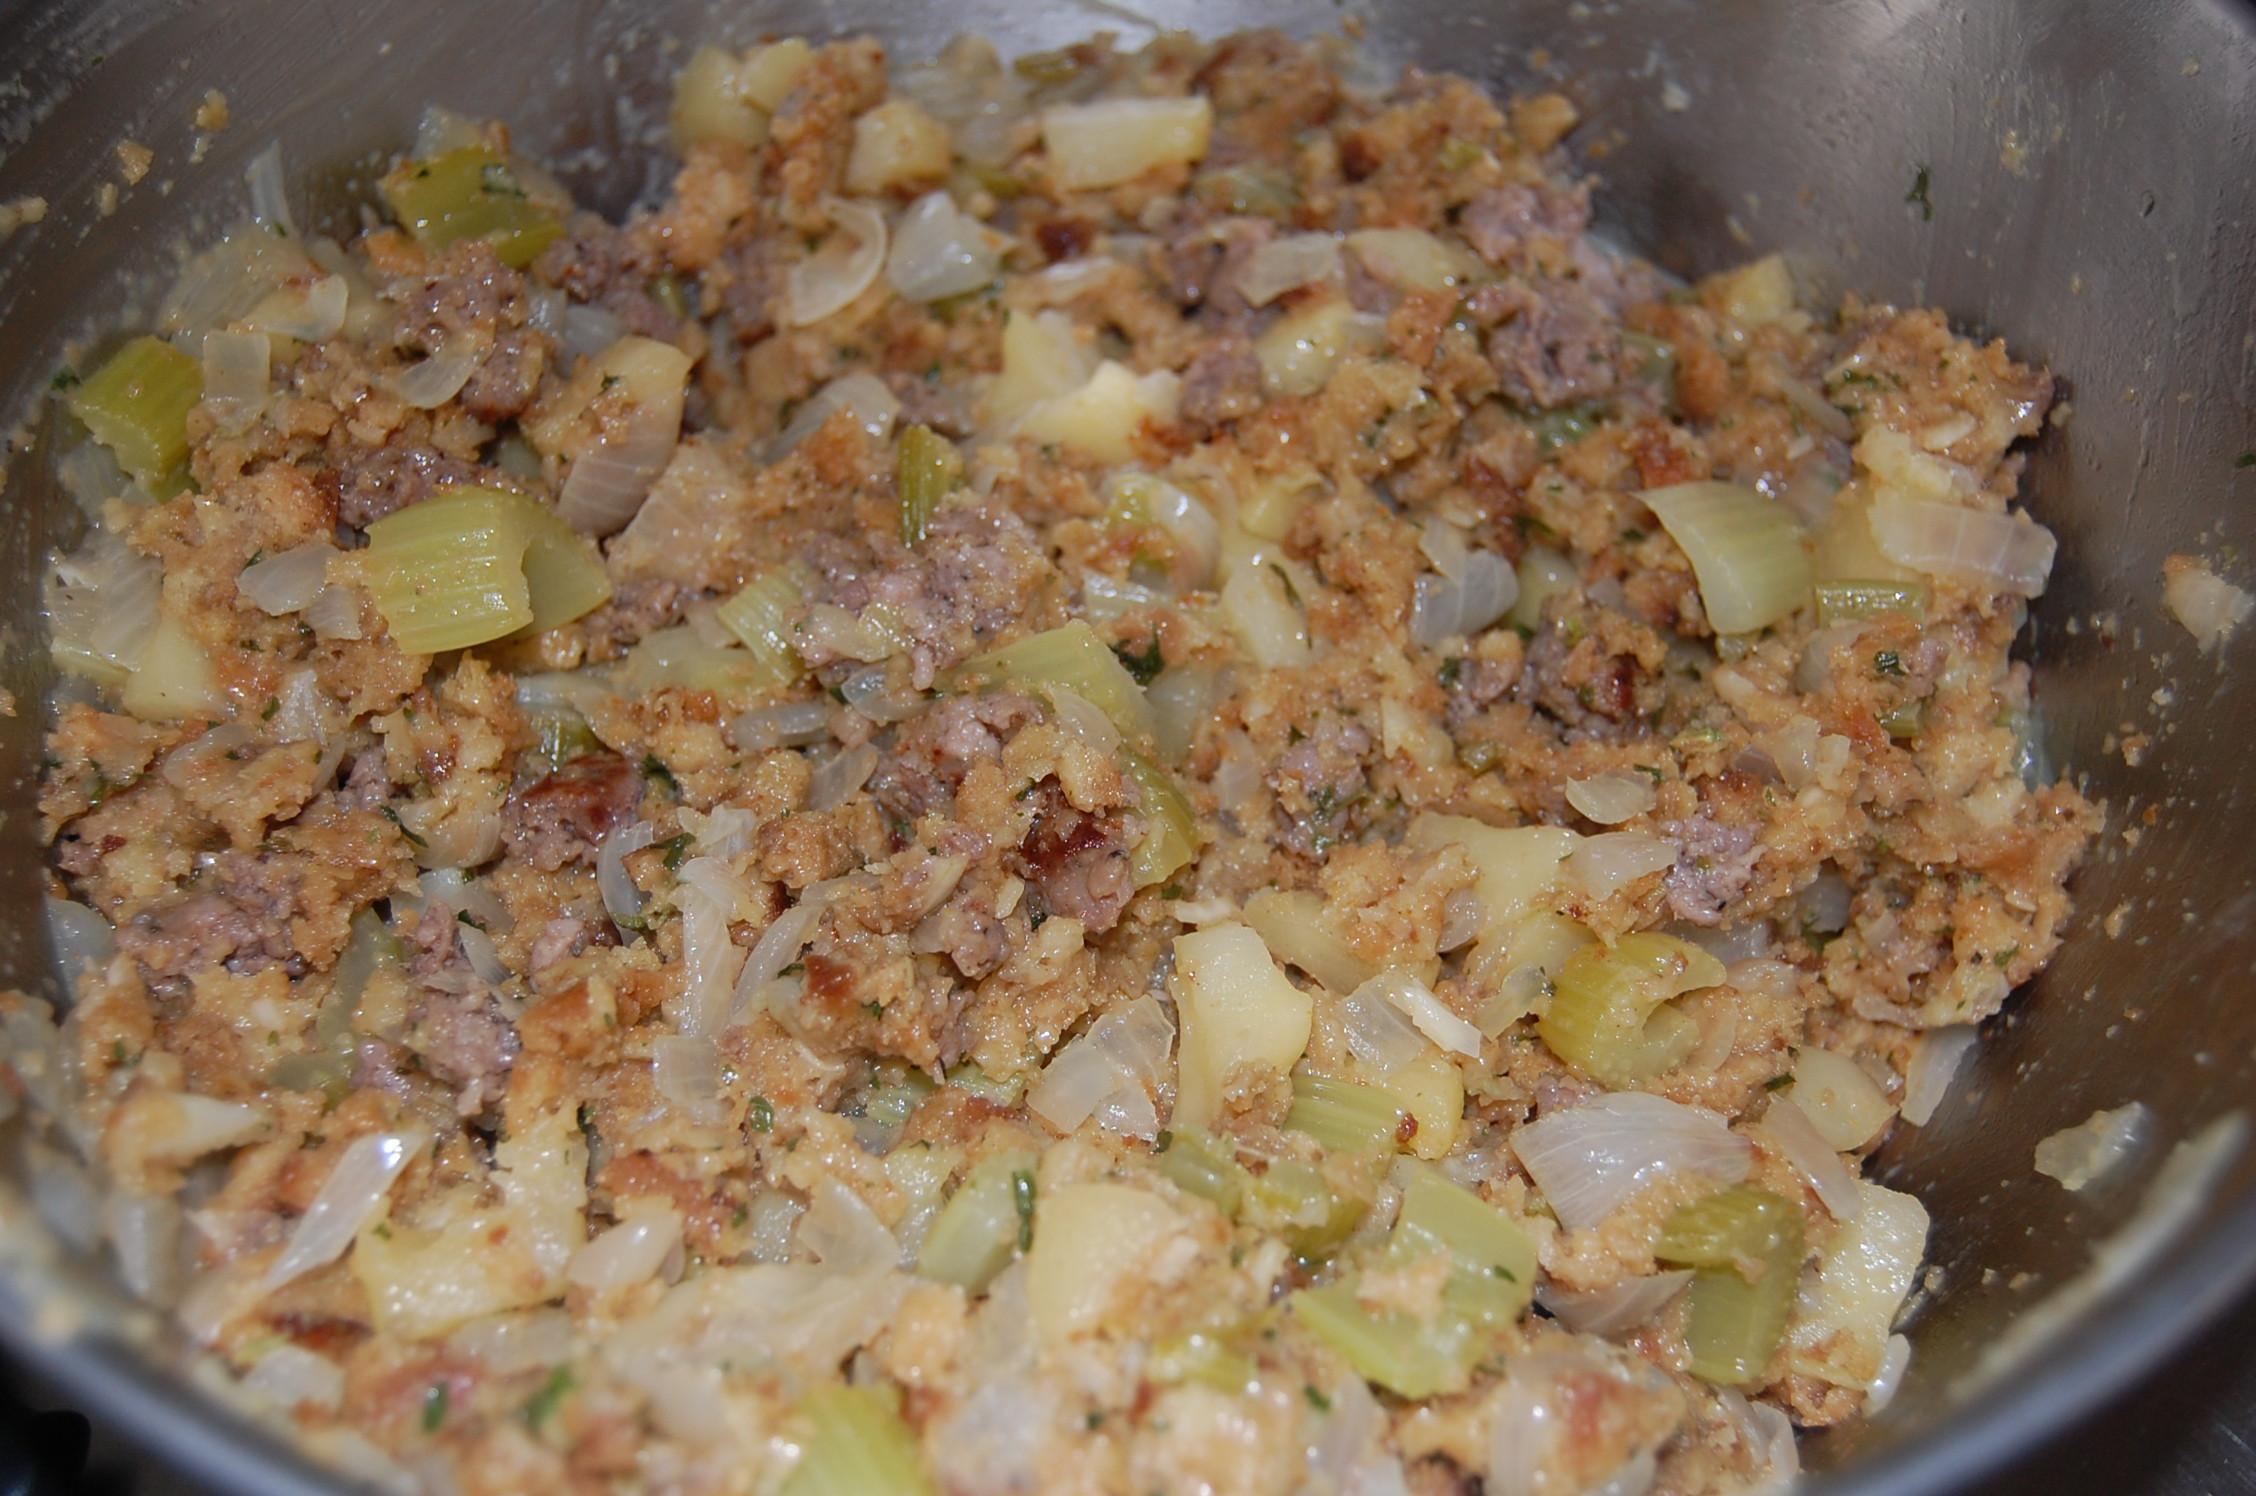 Semi-Homemade Apple Sausage Stuffing